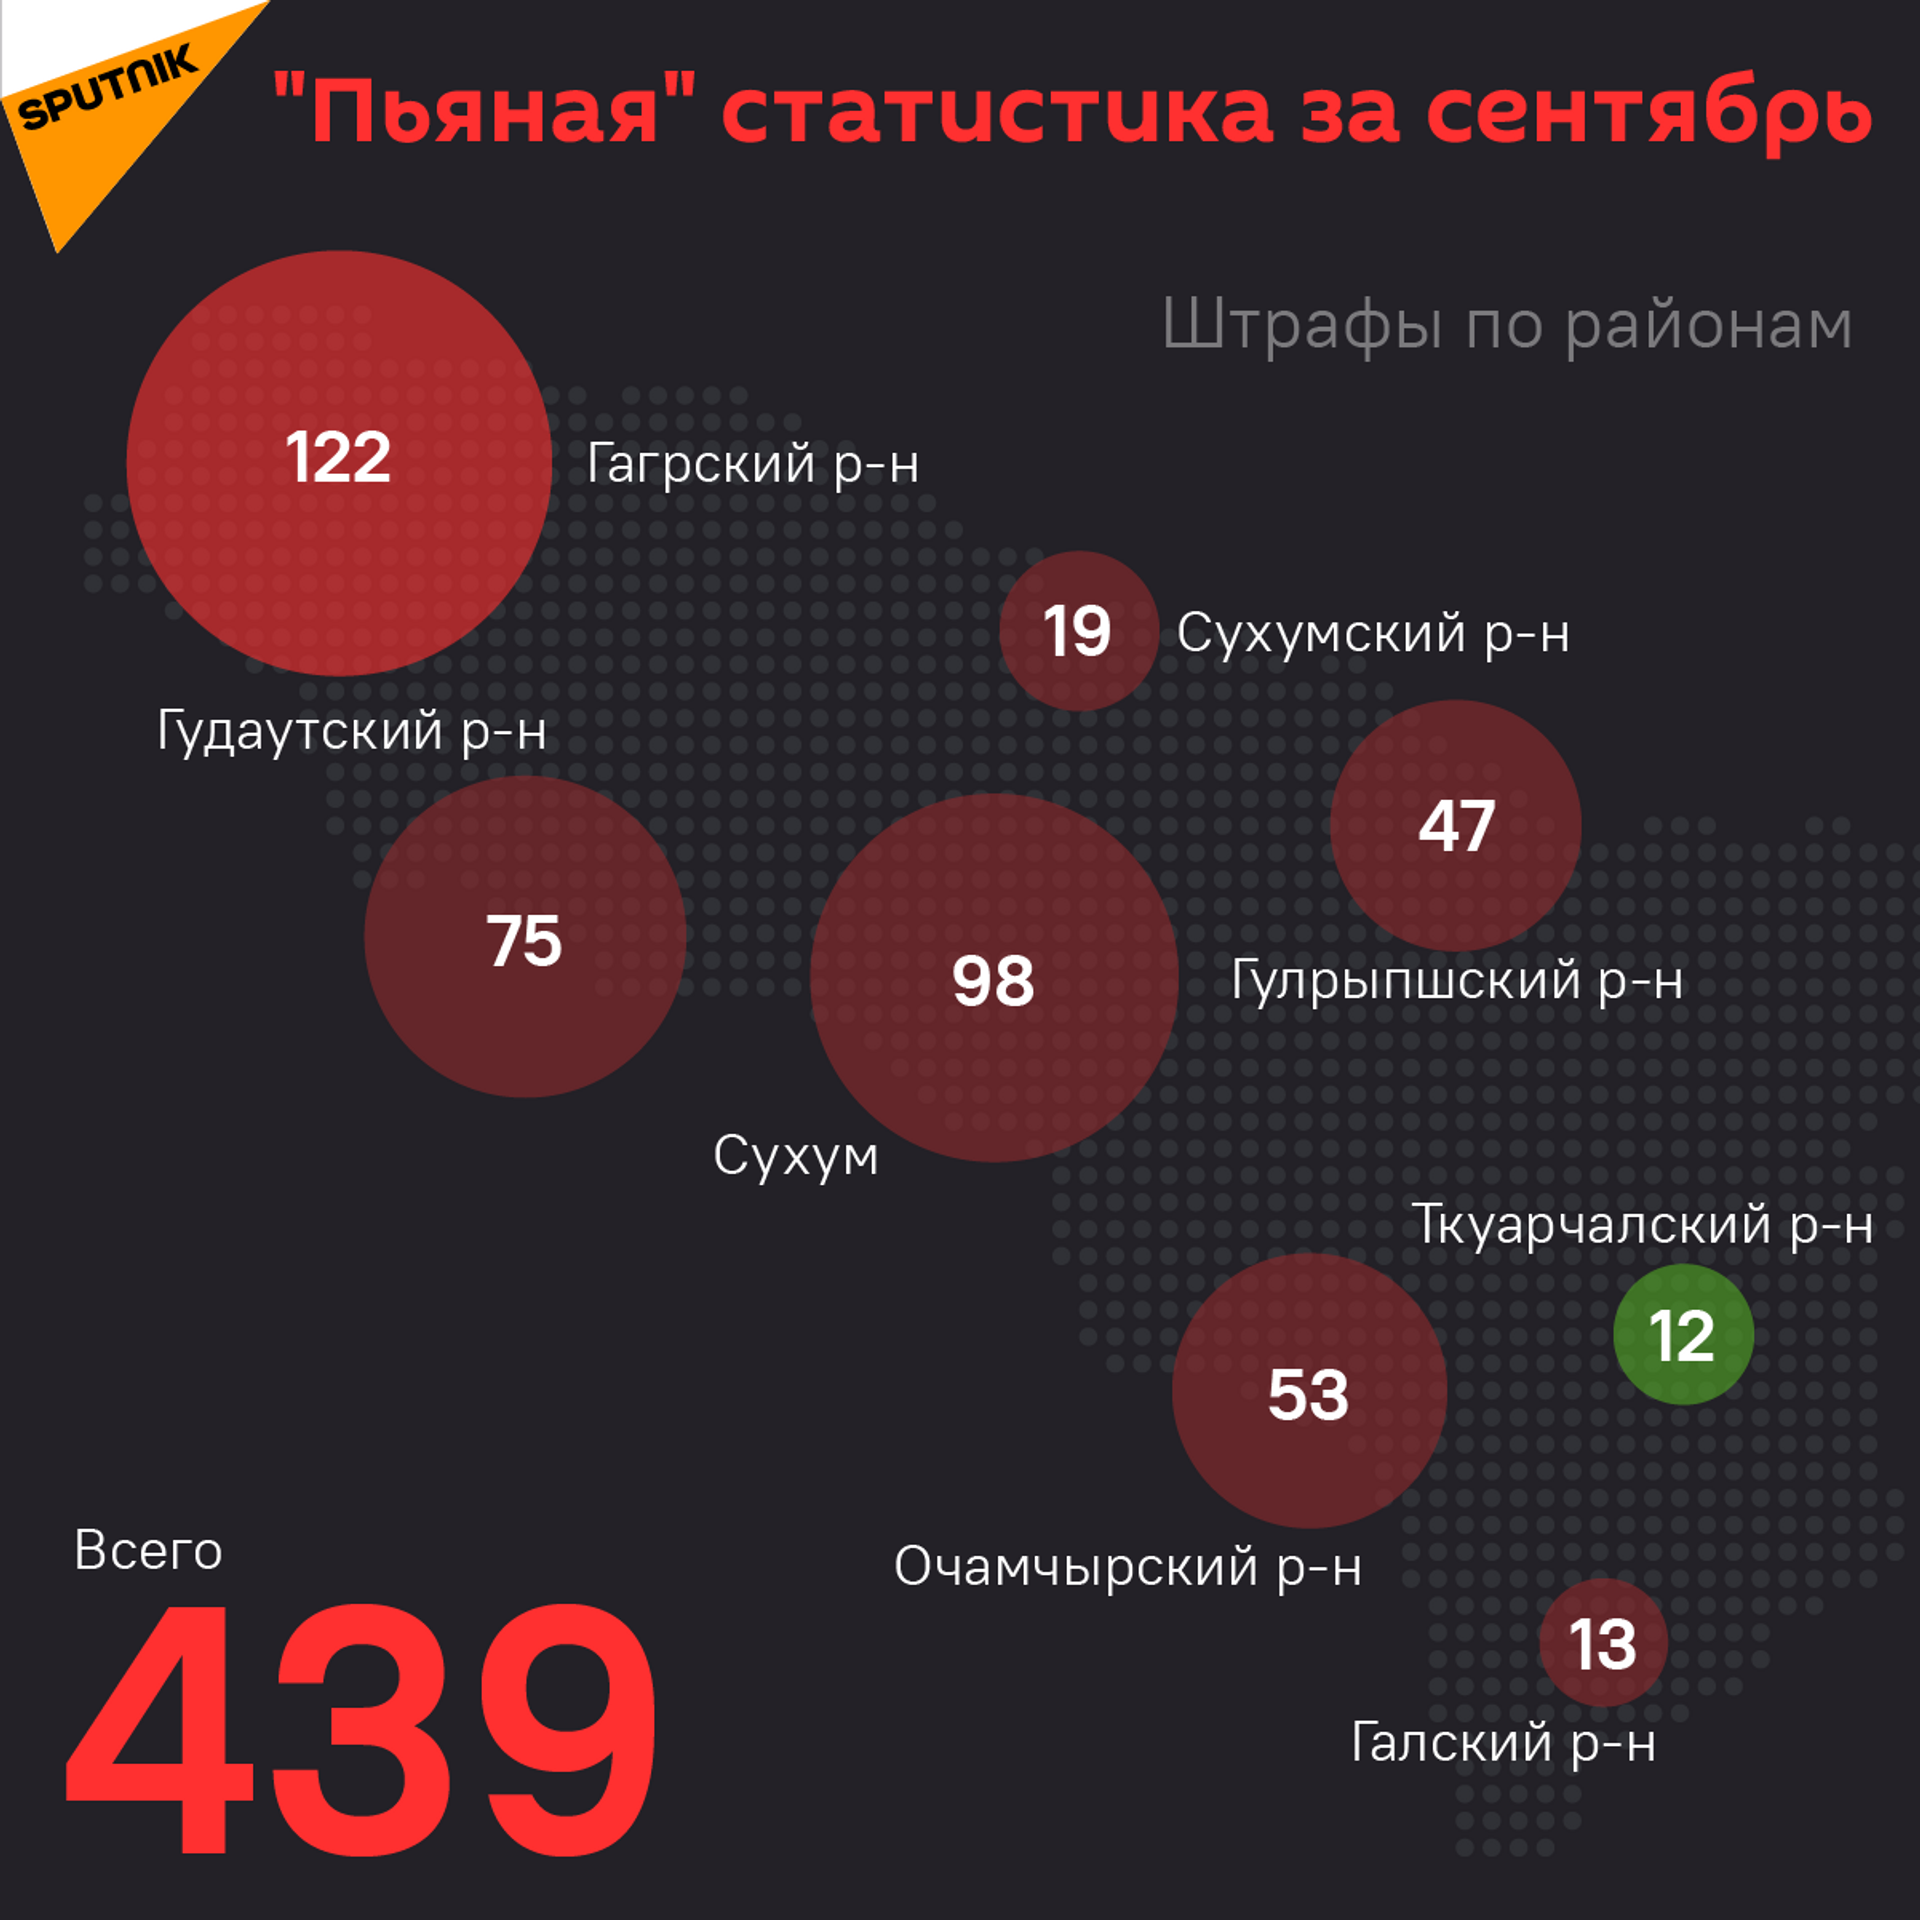 Пьяная статистика за сентябрь  - Sputnik Абхазия, 1920, 12.10.2021